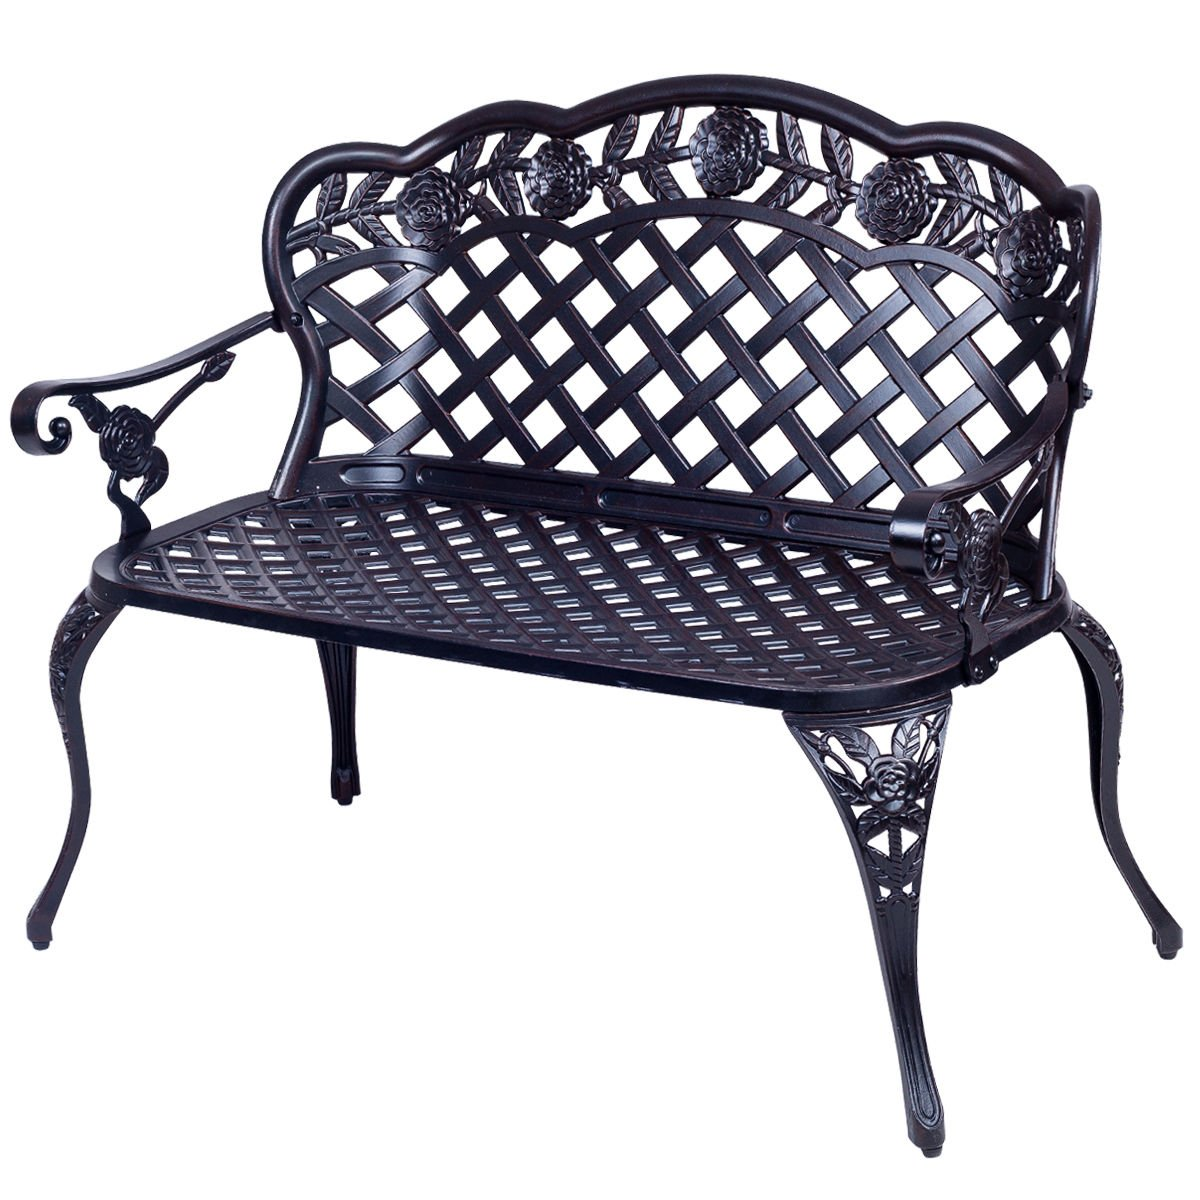 Amazon com giantex 42 5 patio garden bench cast aluminum park yard seating antique outdoor furniture seat rose design garden outdoor